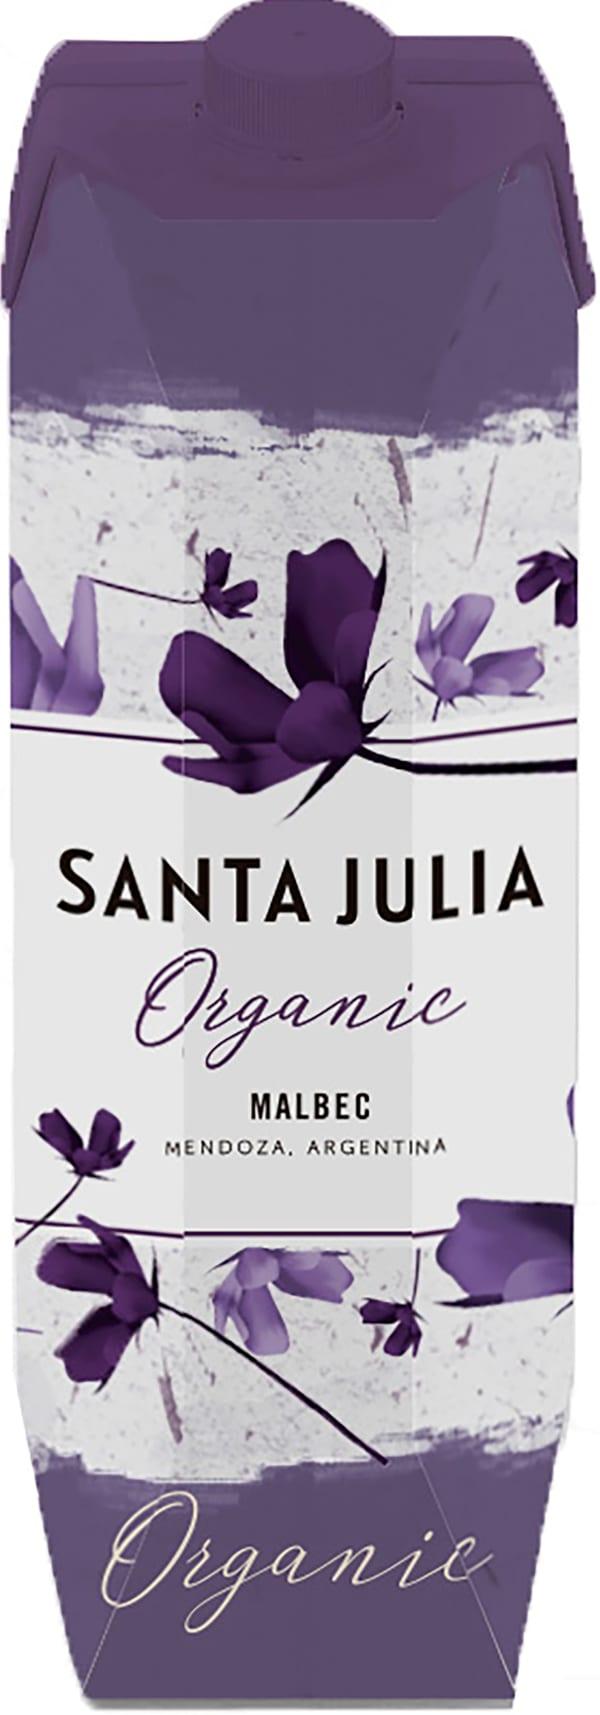 Santa Julia Organic Malbec 2018 carton package